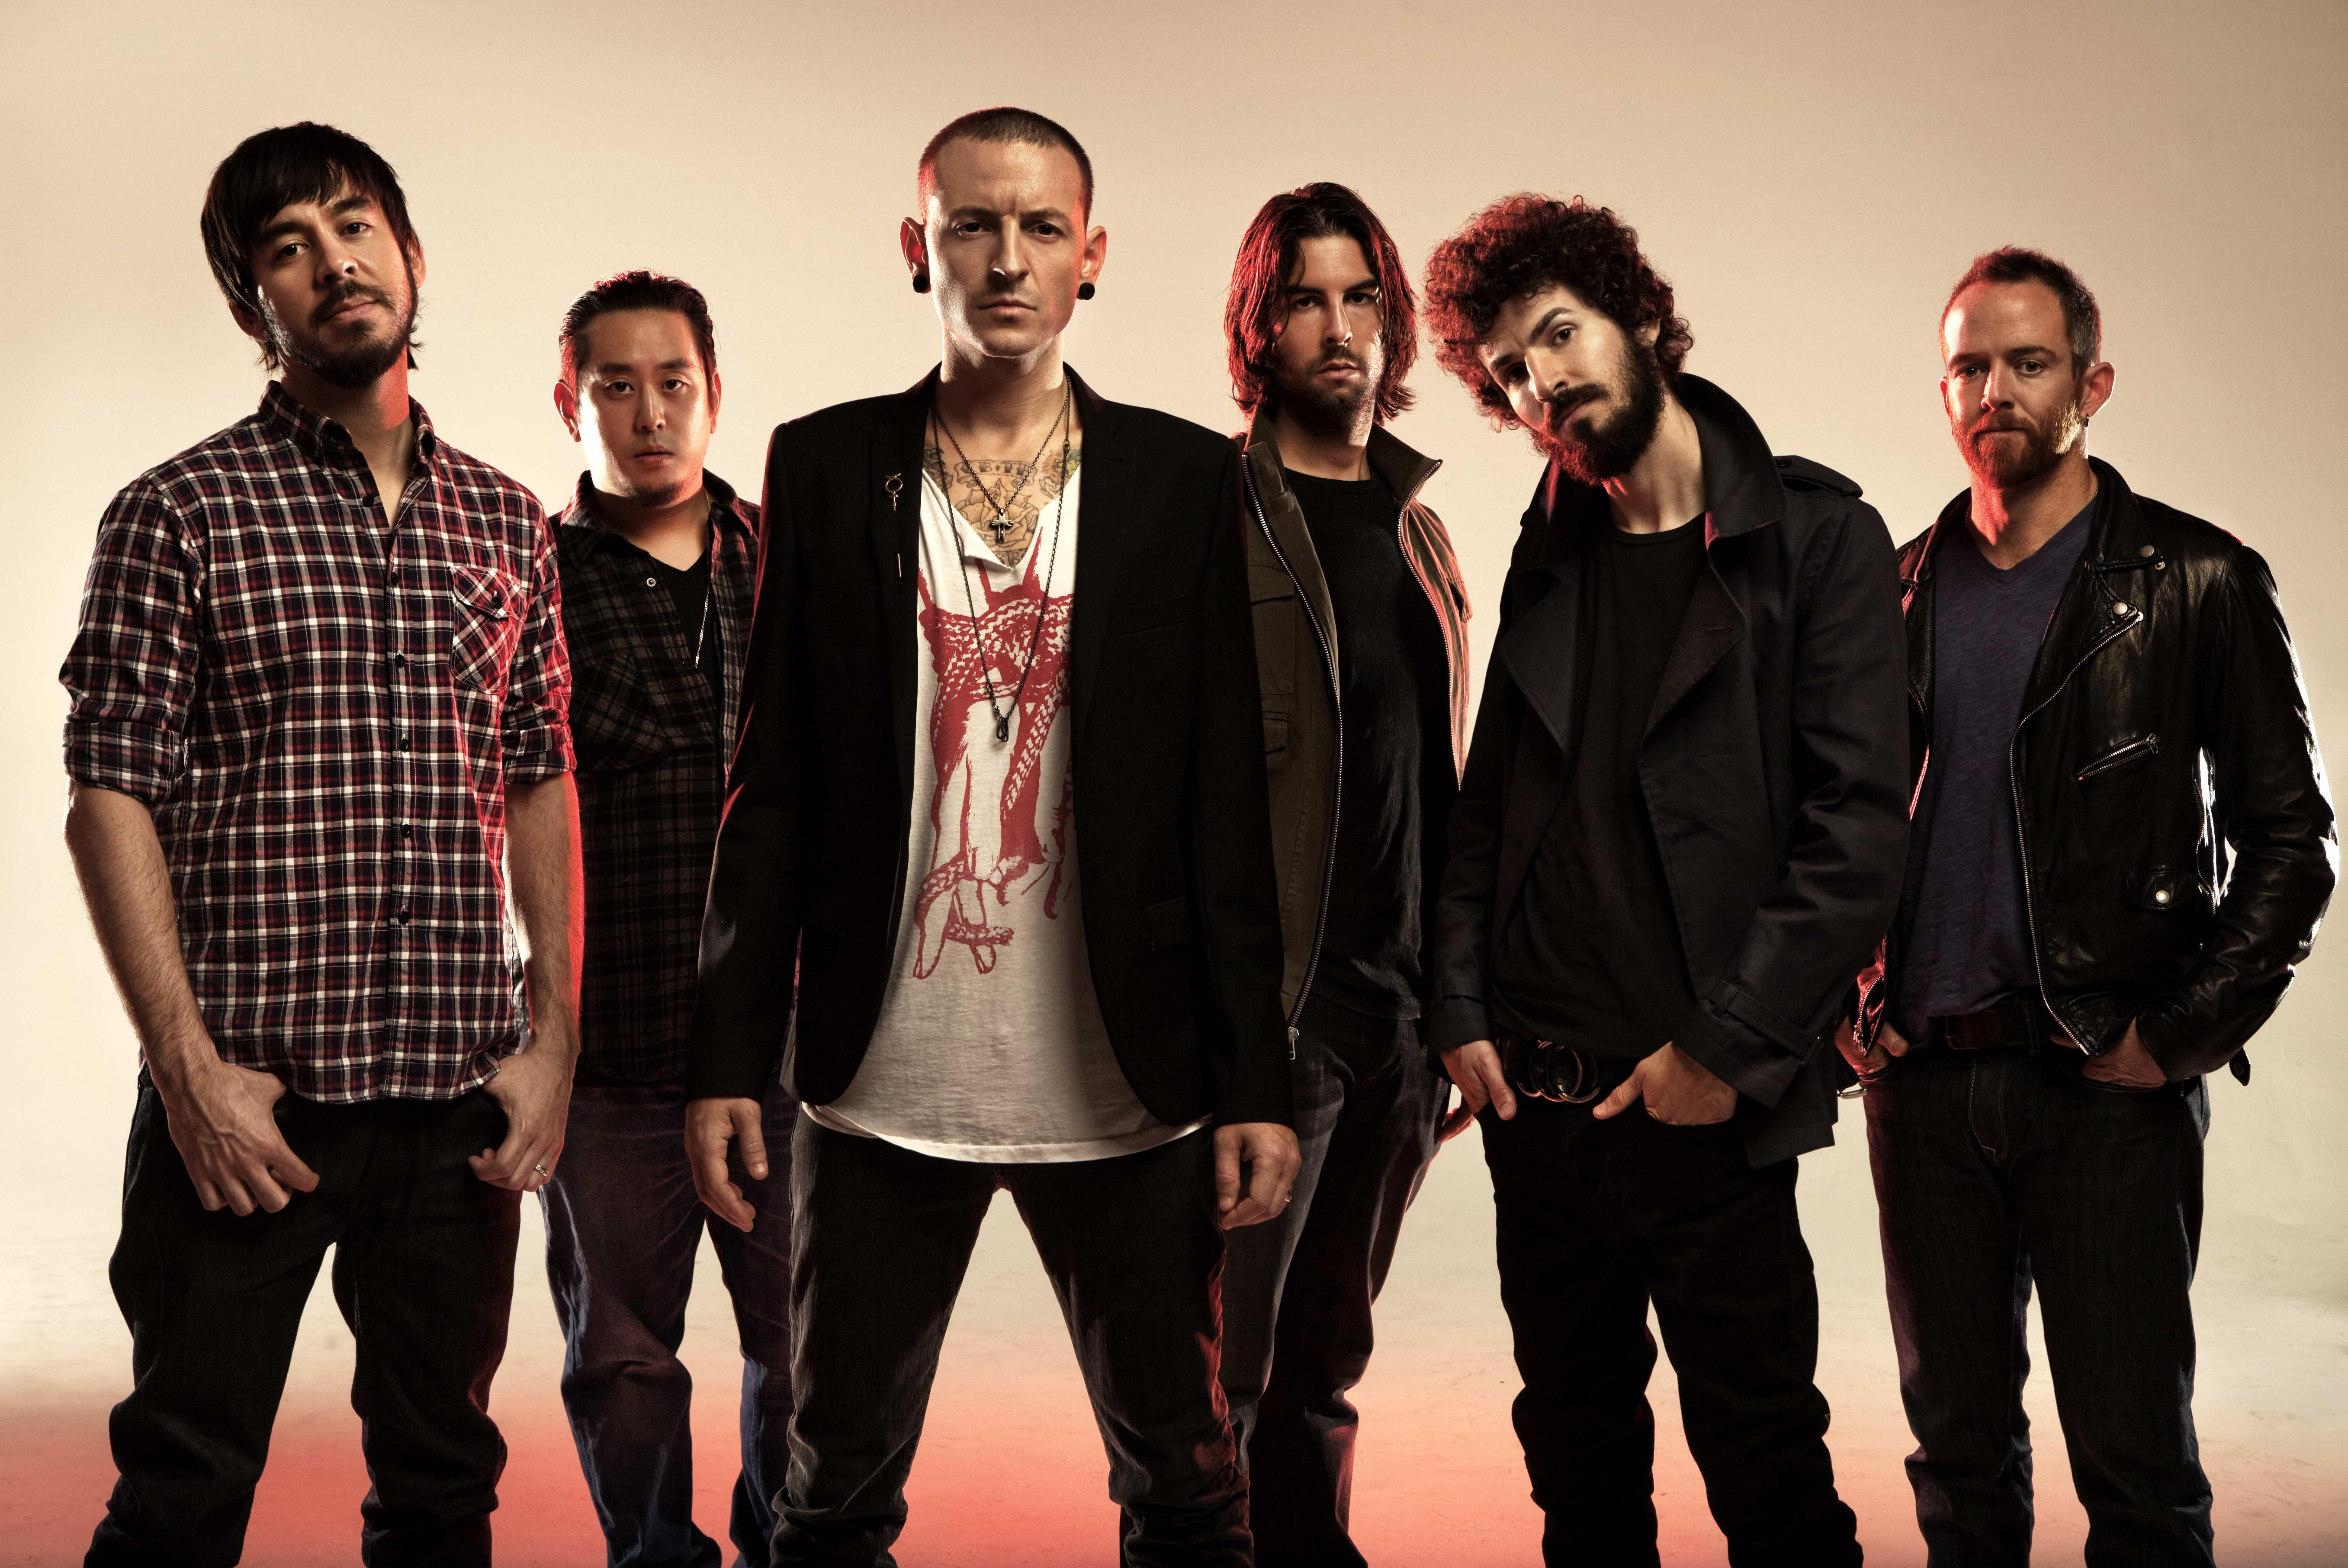 http://rockcult.ru/wp-content/uploads/2014/03/LinkinPark-v-msk.jpg